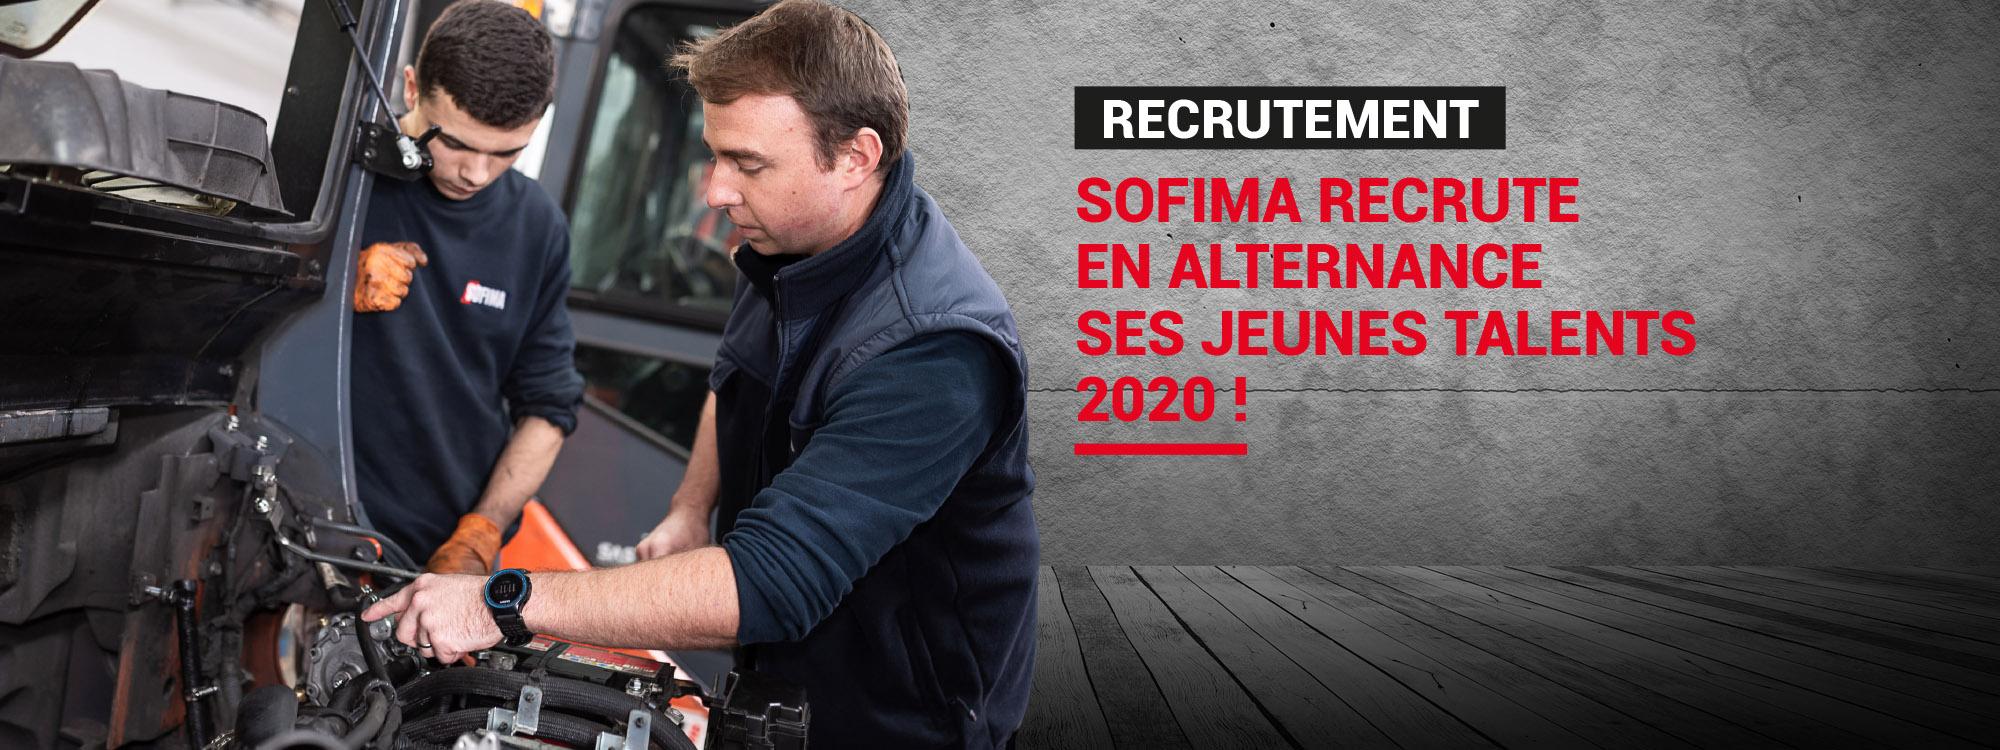 Recrutement SOFIMA